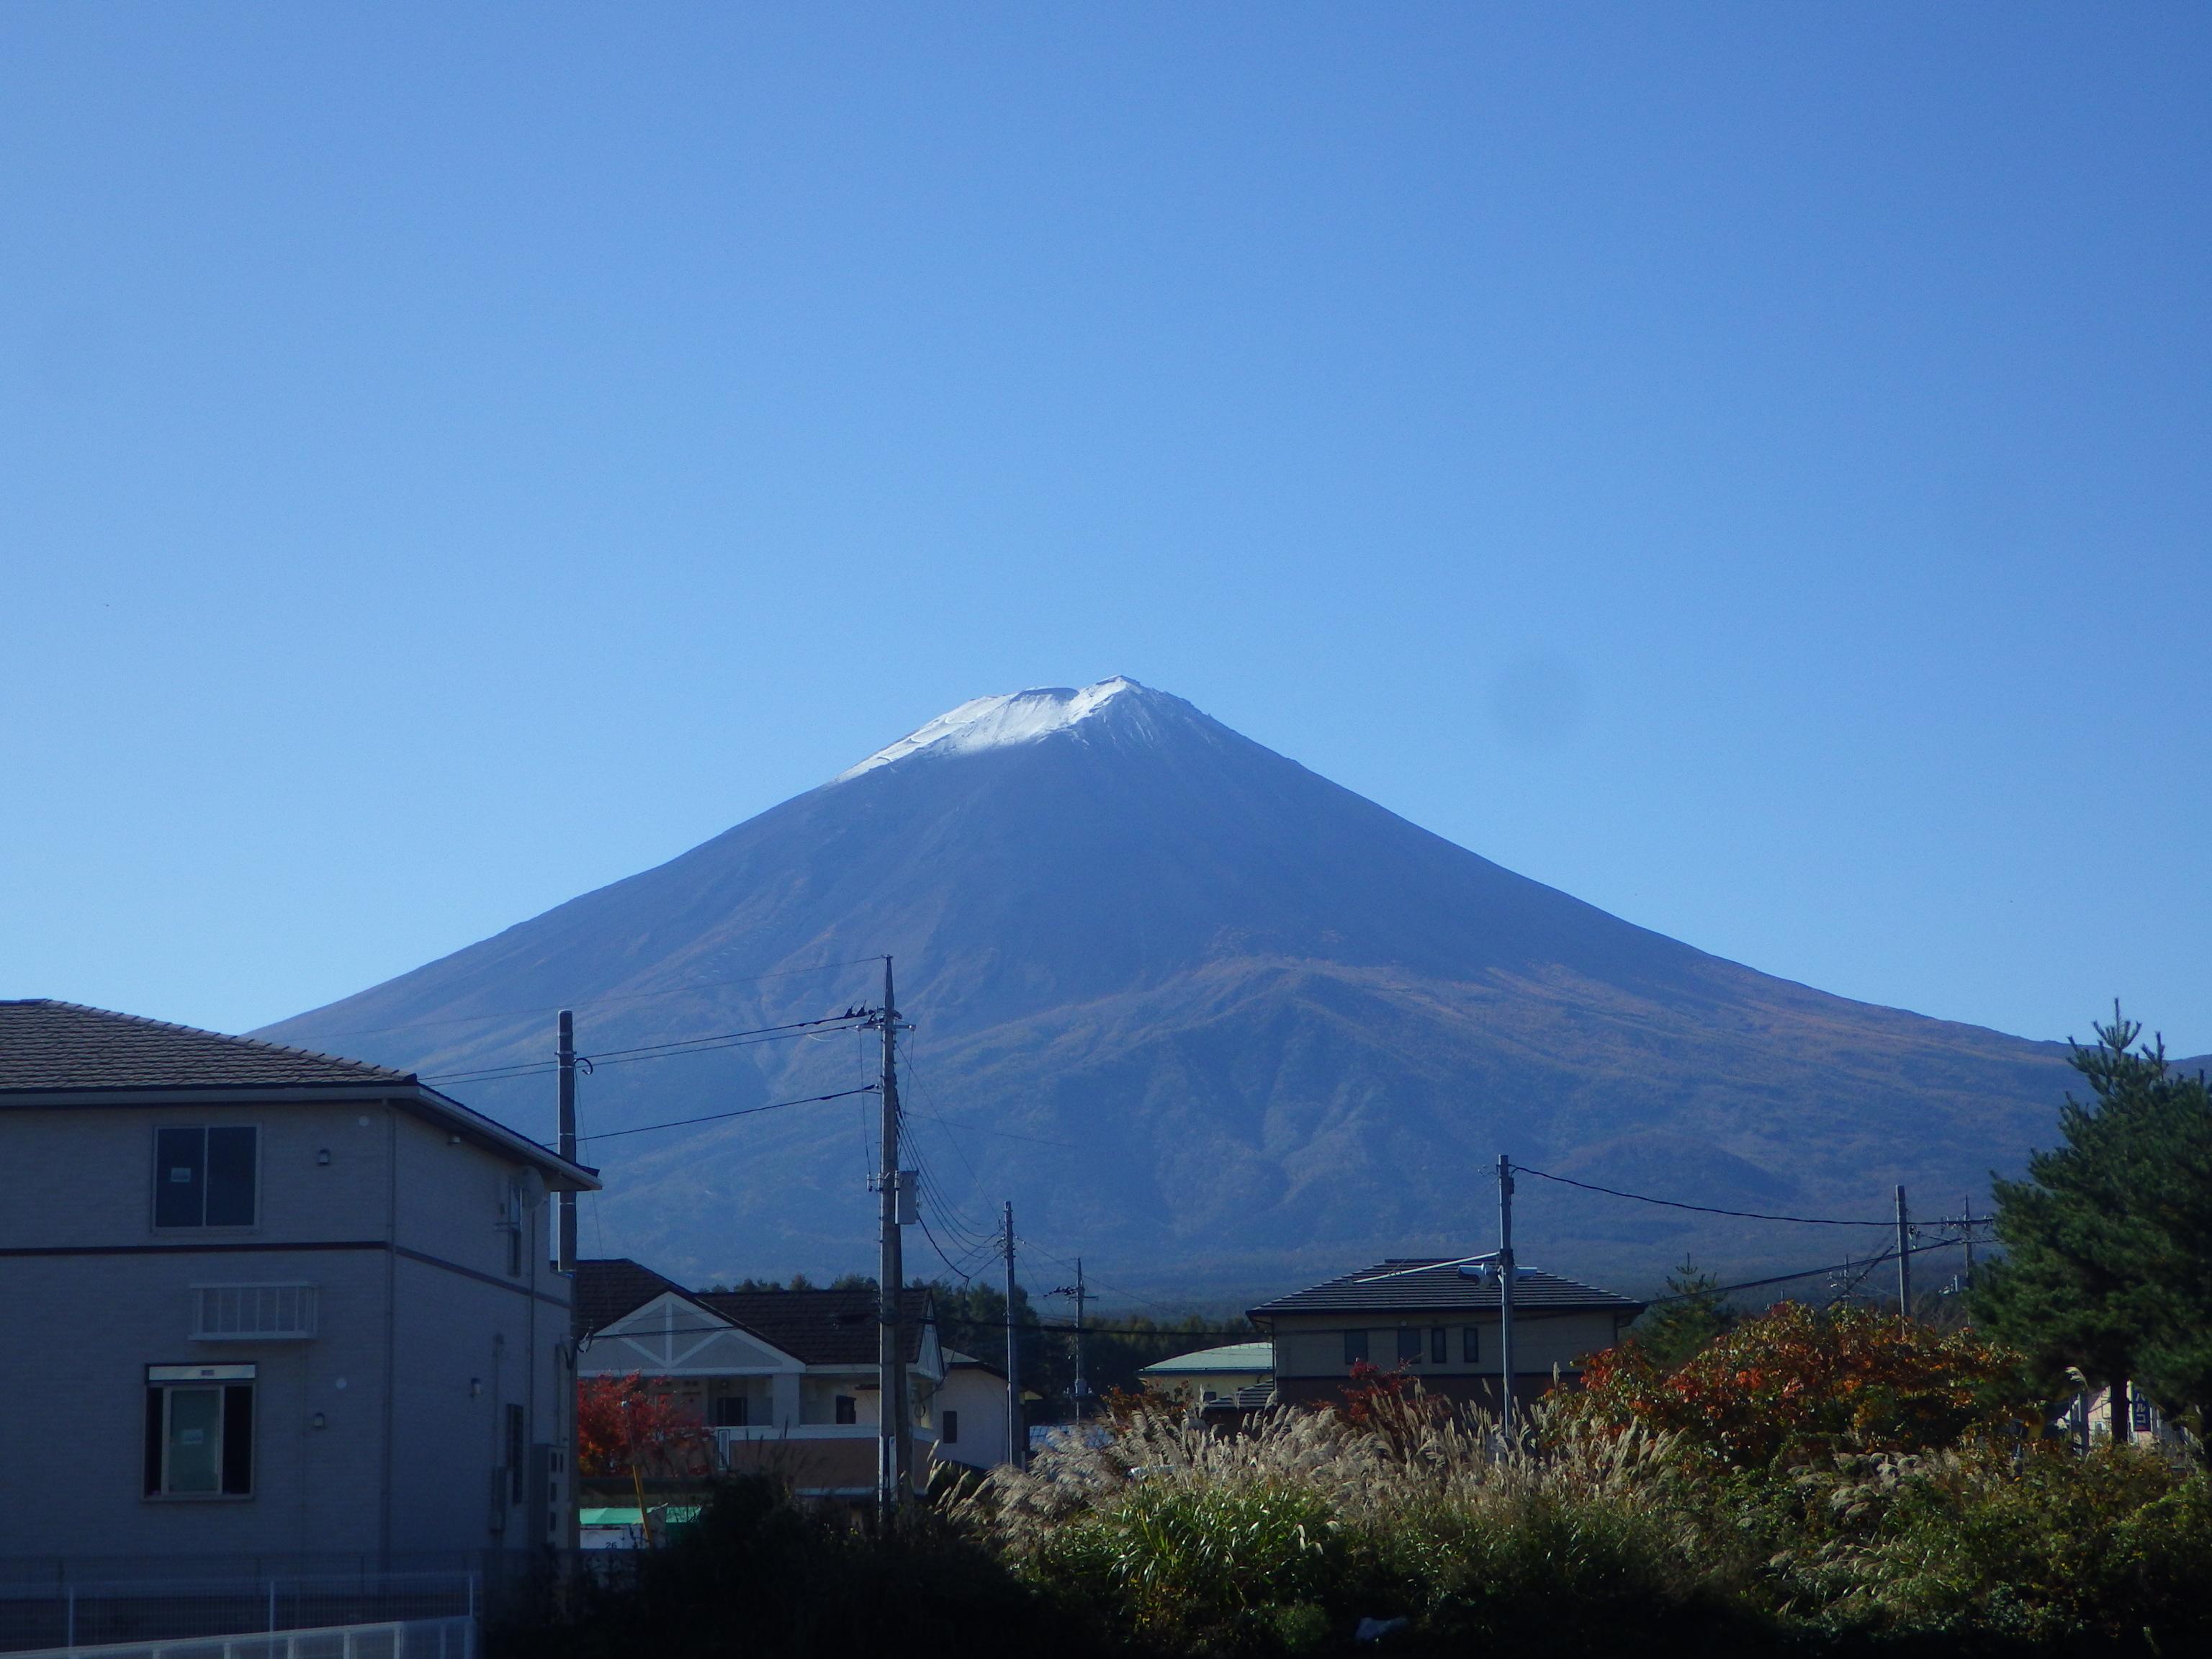 http://www.yamanashi-kankou.jp/blog/USER9744.JPG